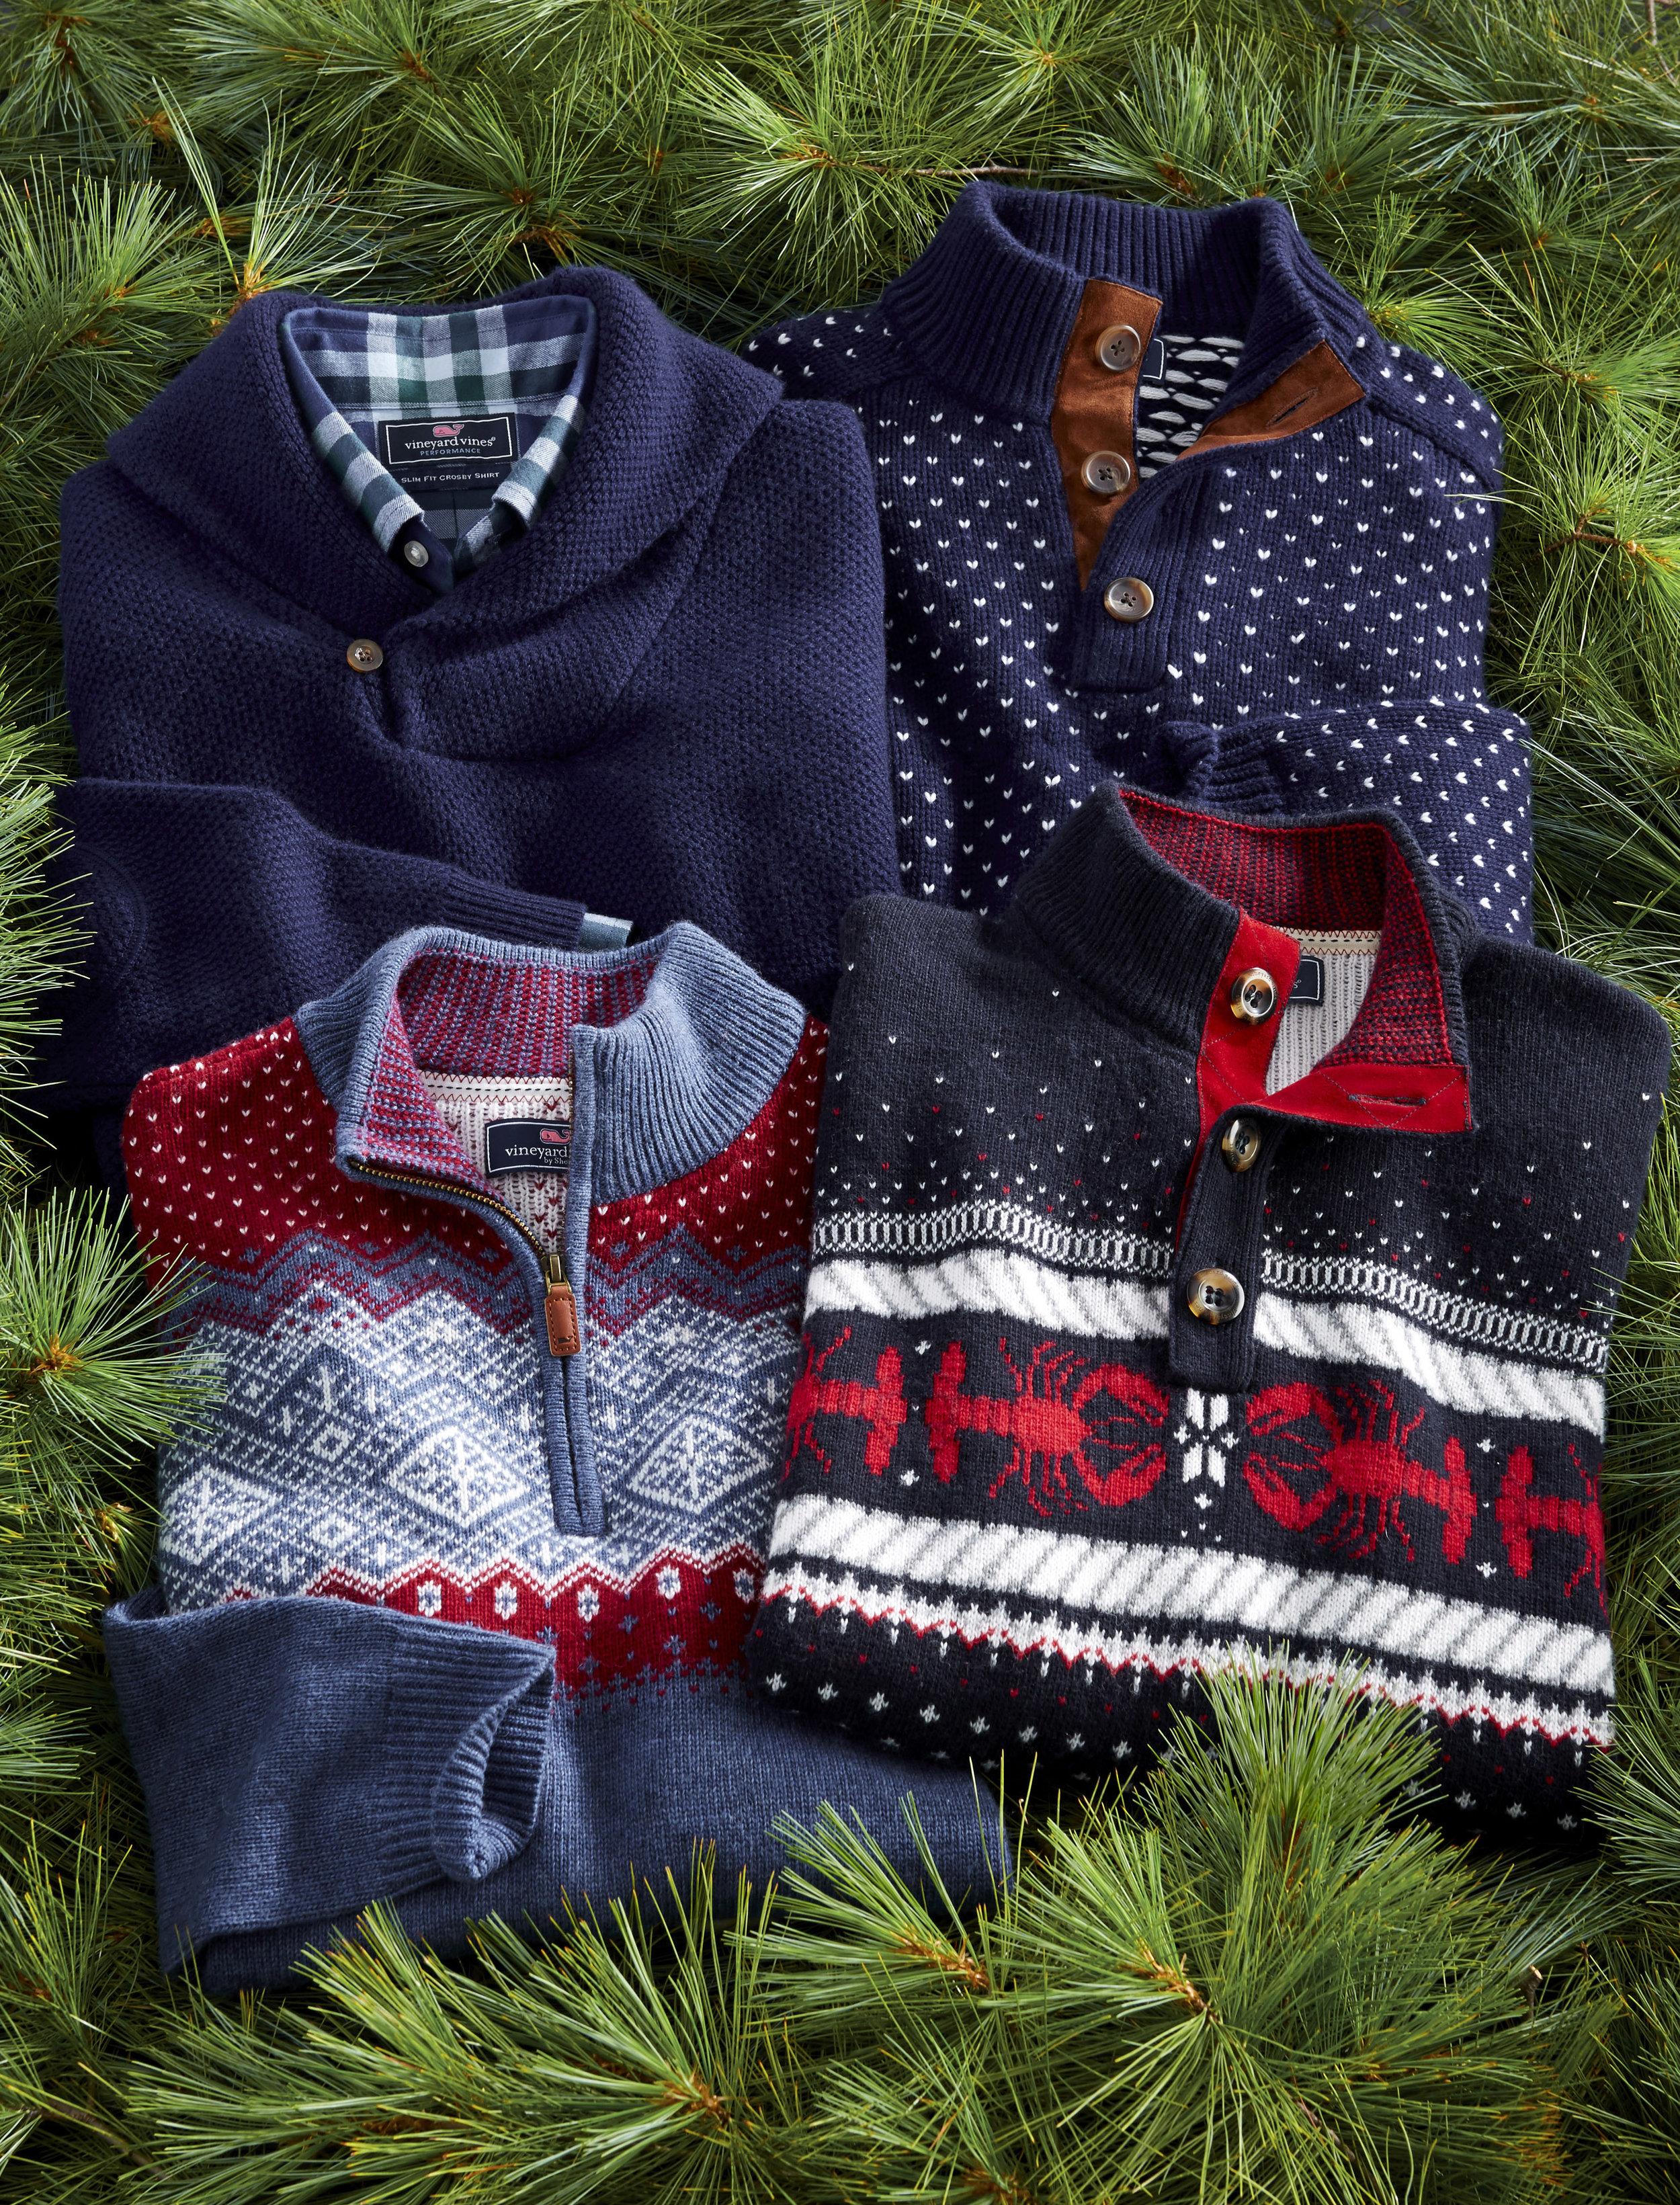 M_Sweaters5568.jpg